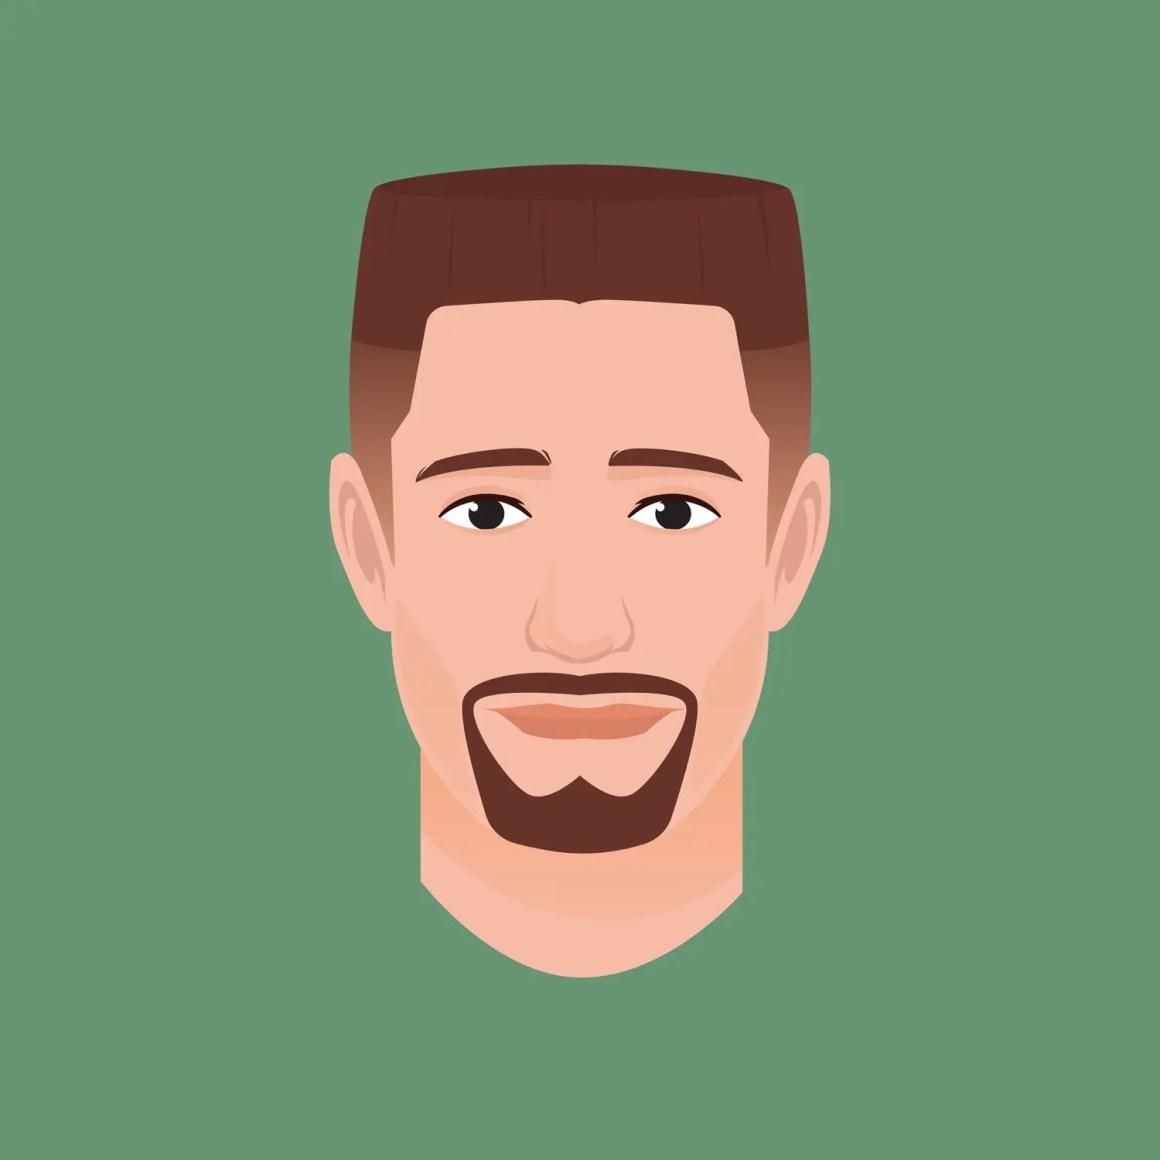 Men's Military Haircuts - The Flat Top